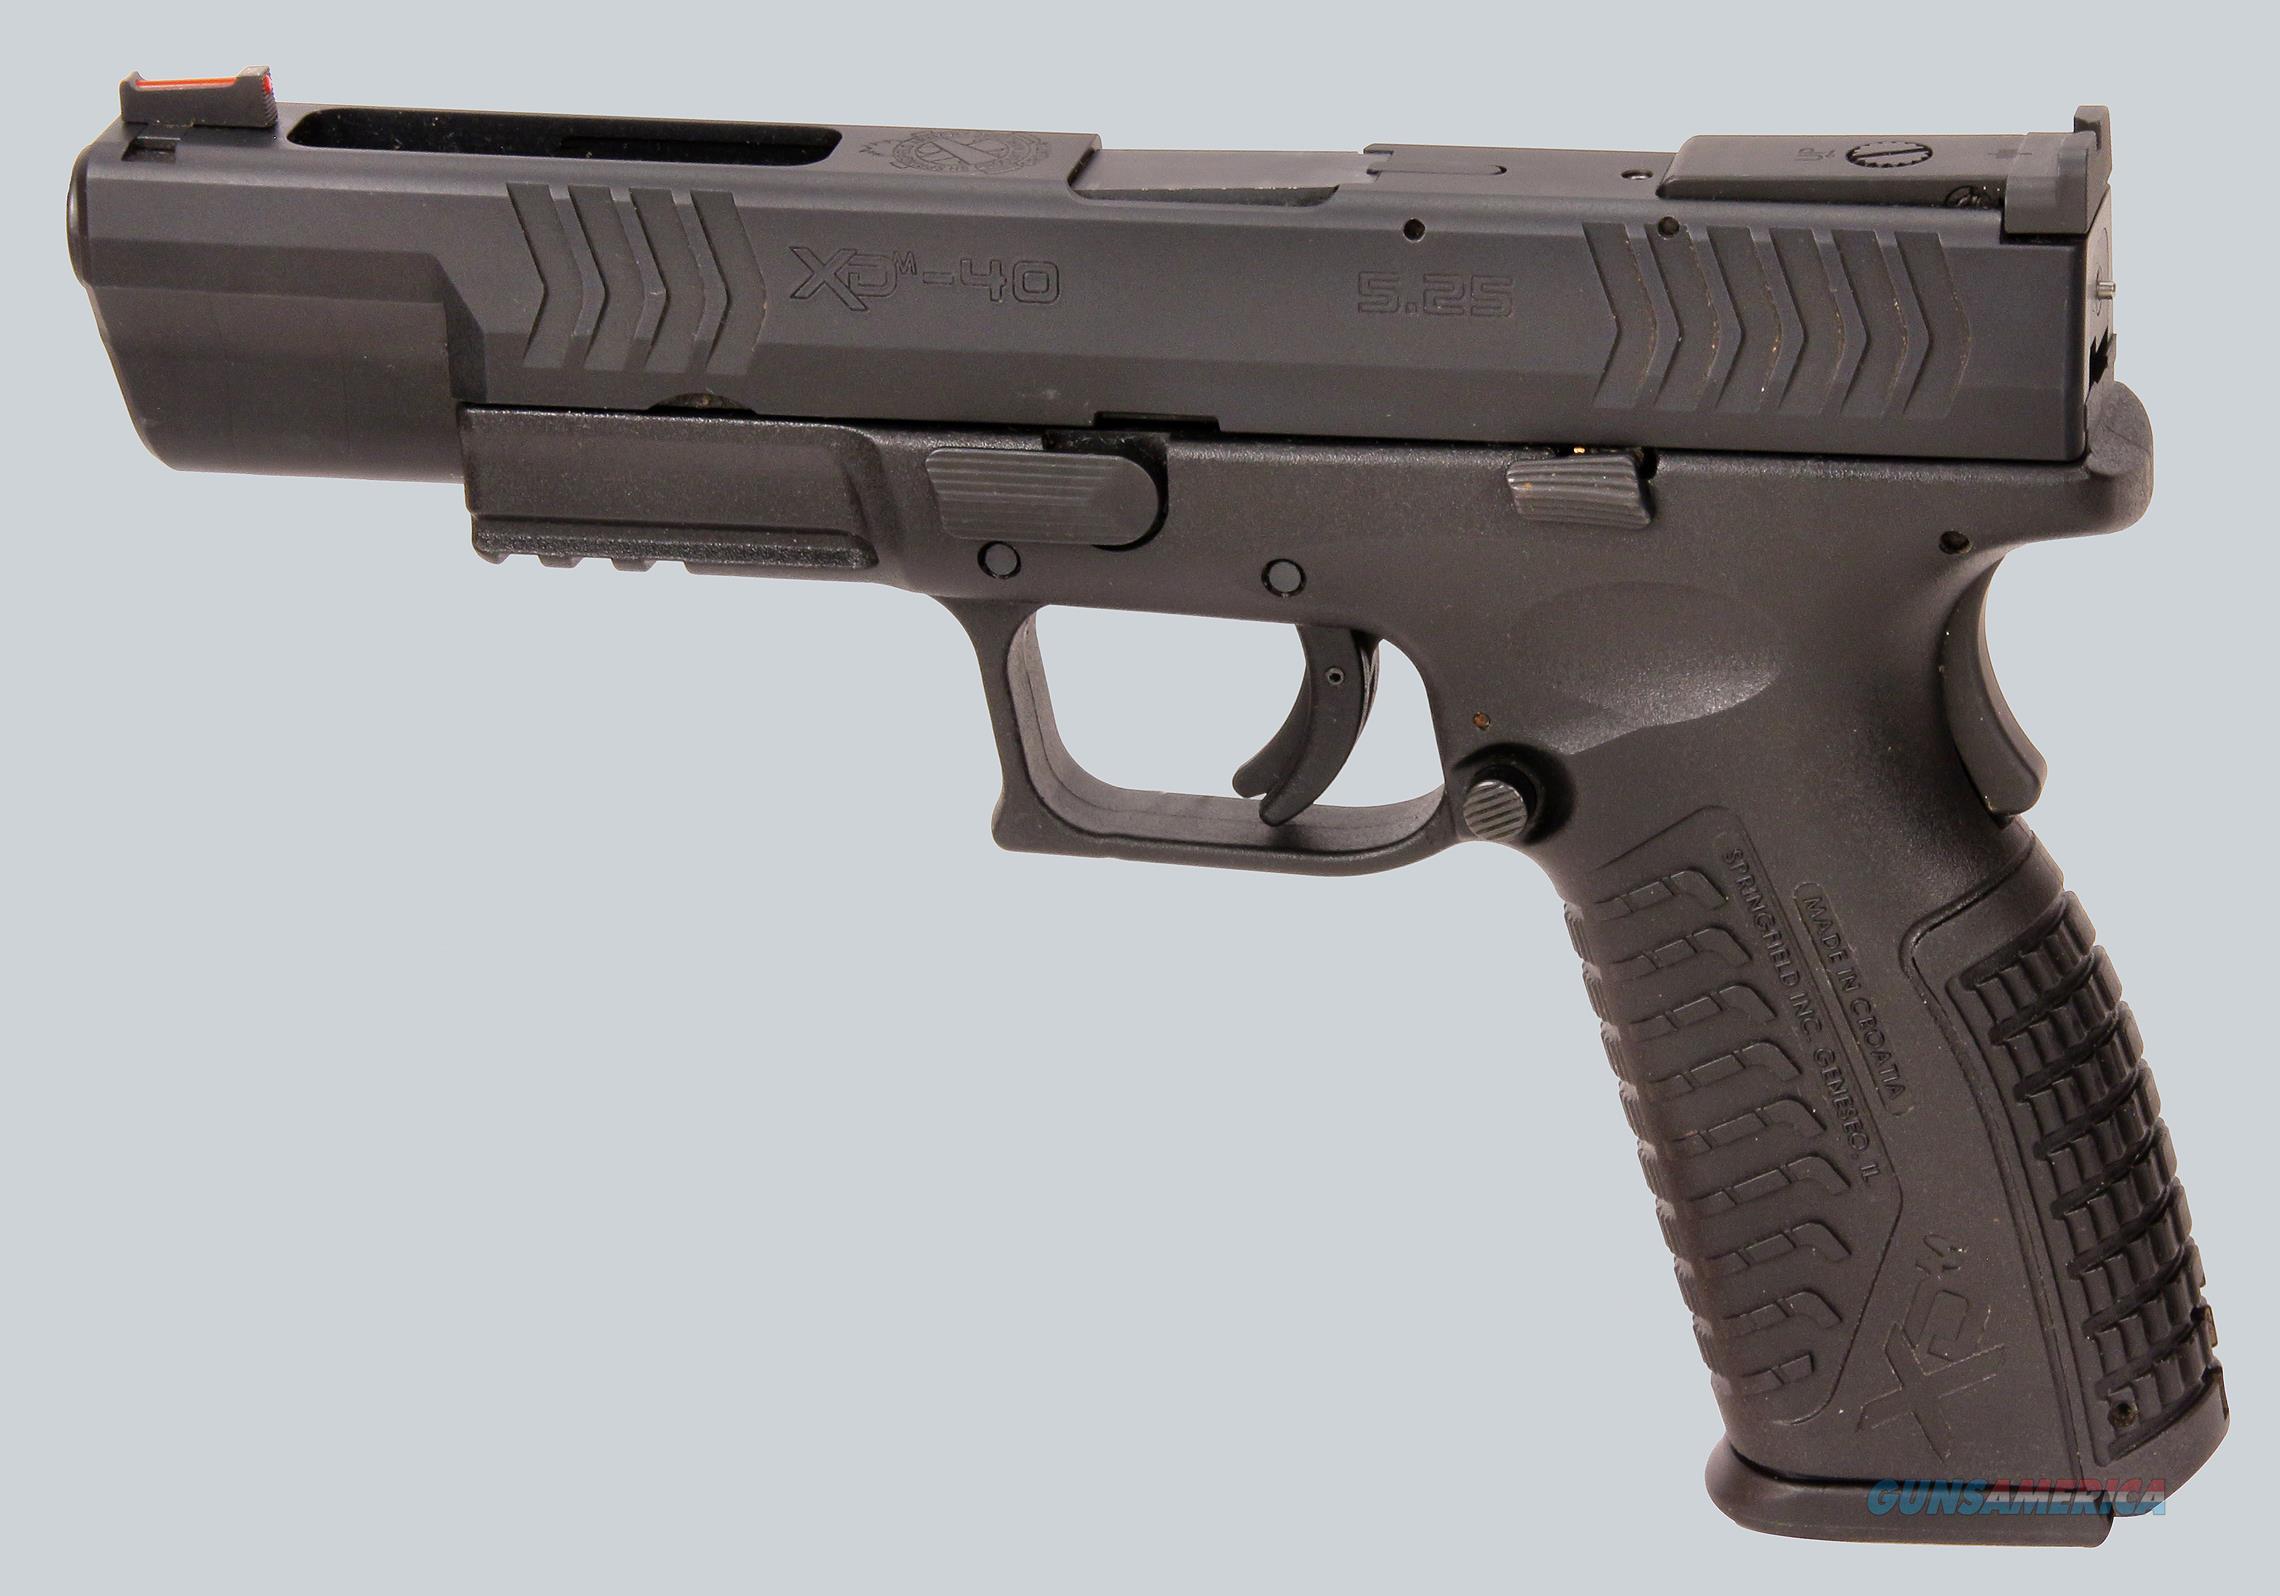 Springfield Armory 40cal S&W XD40 Pistol  Guns > Pistols > Springfield Armory Pistols > XD (eXtreme Duty)